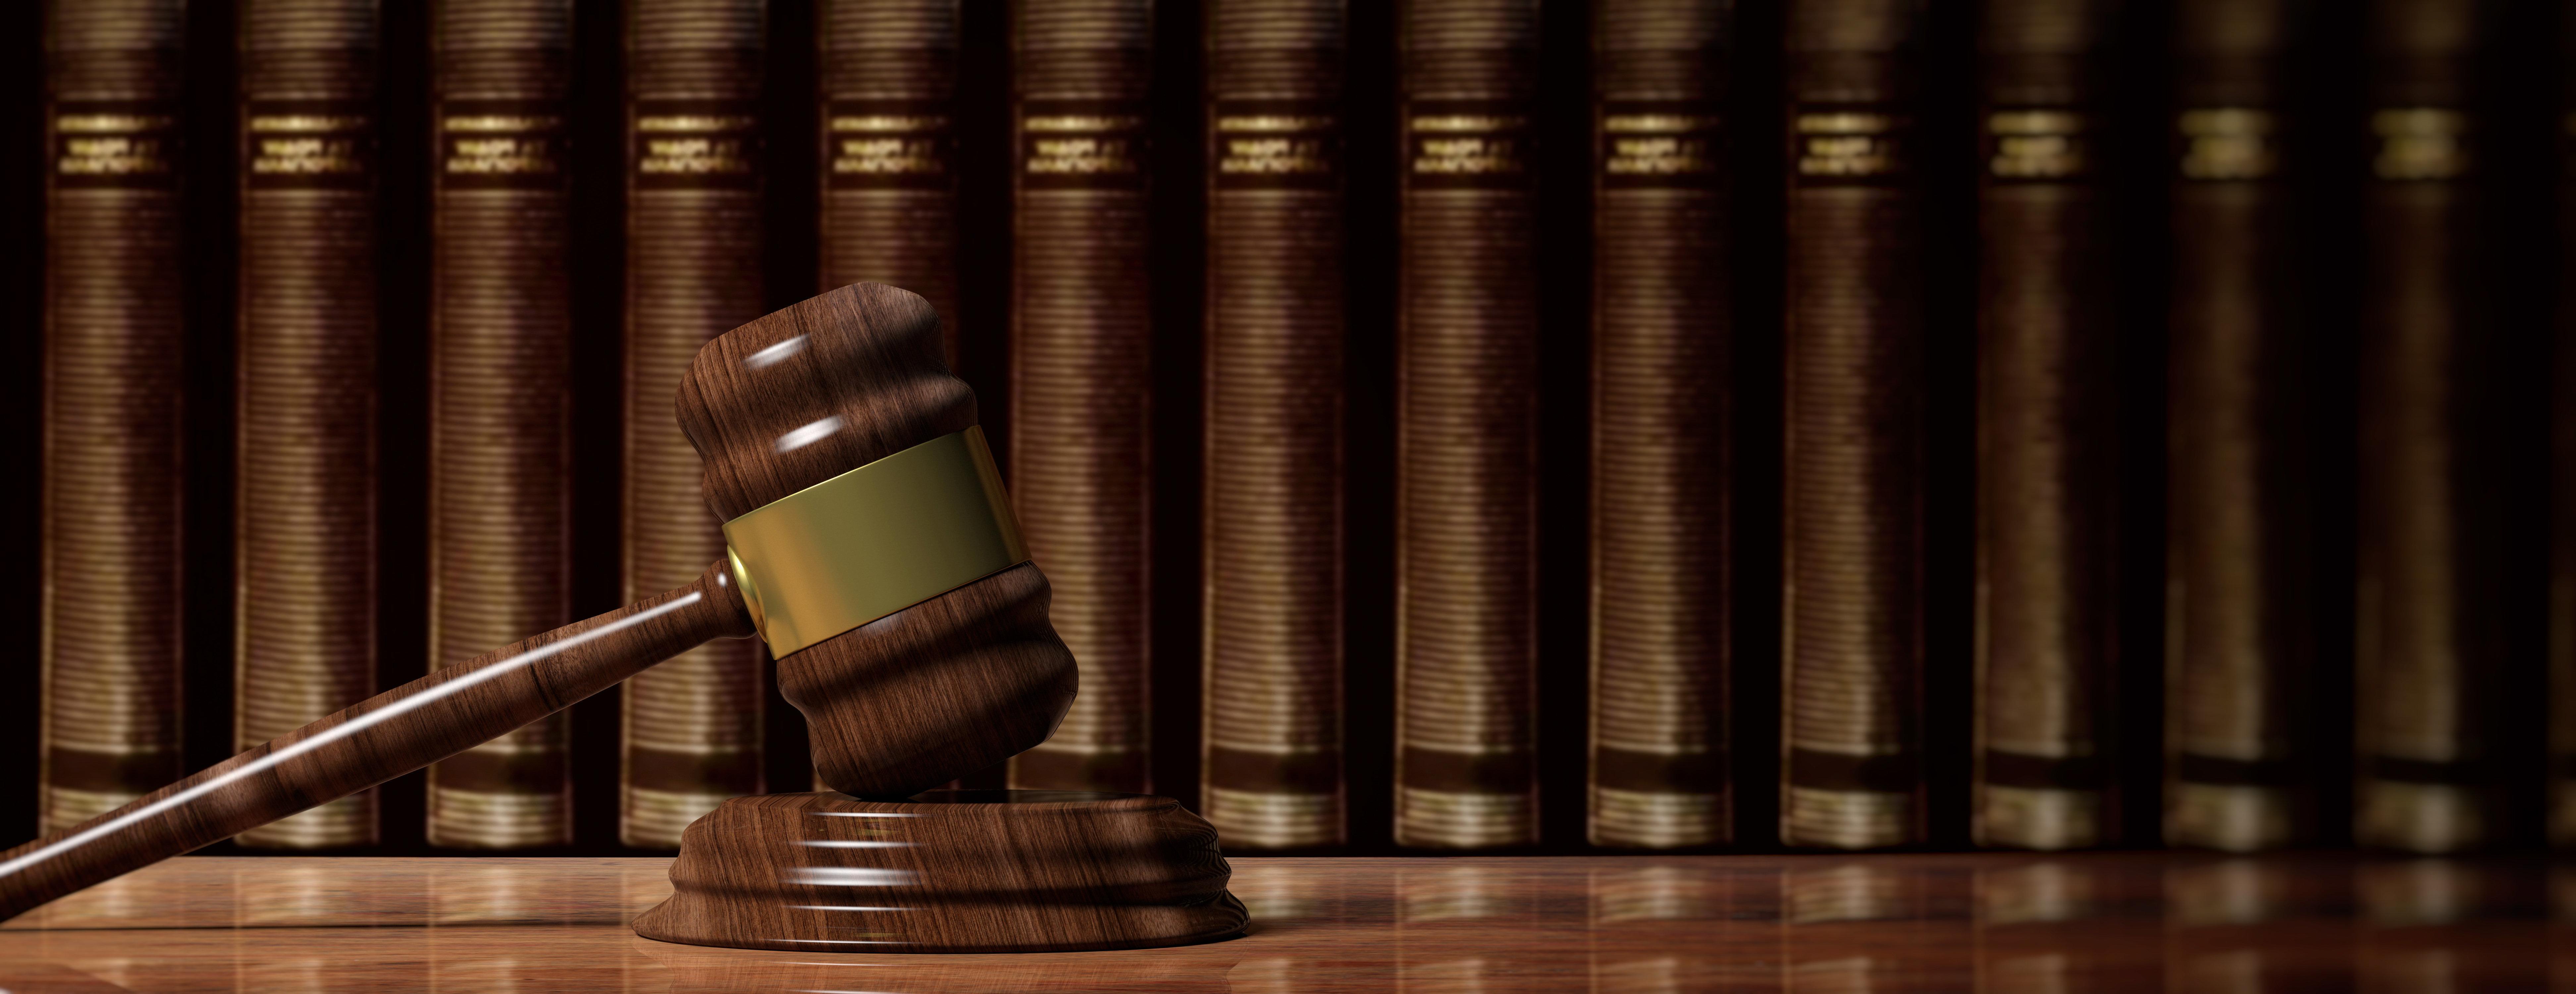 Law concept. Wooden judge gavel on law books background, banner. 3d illustration